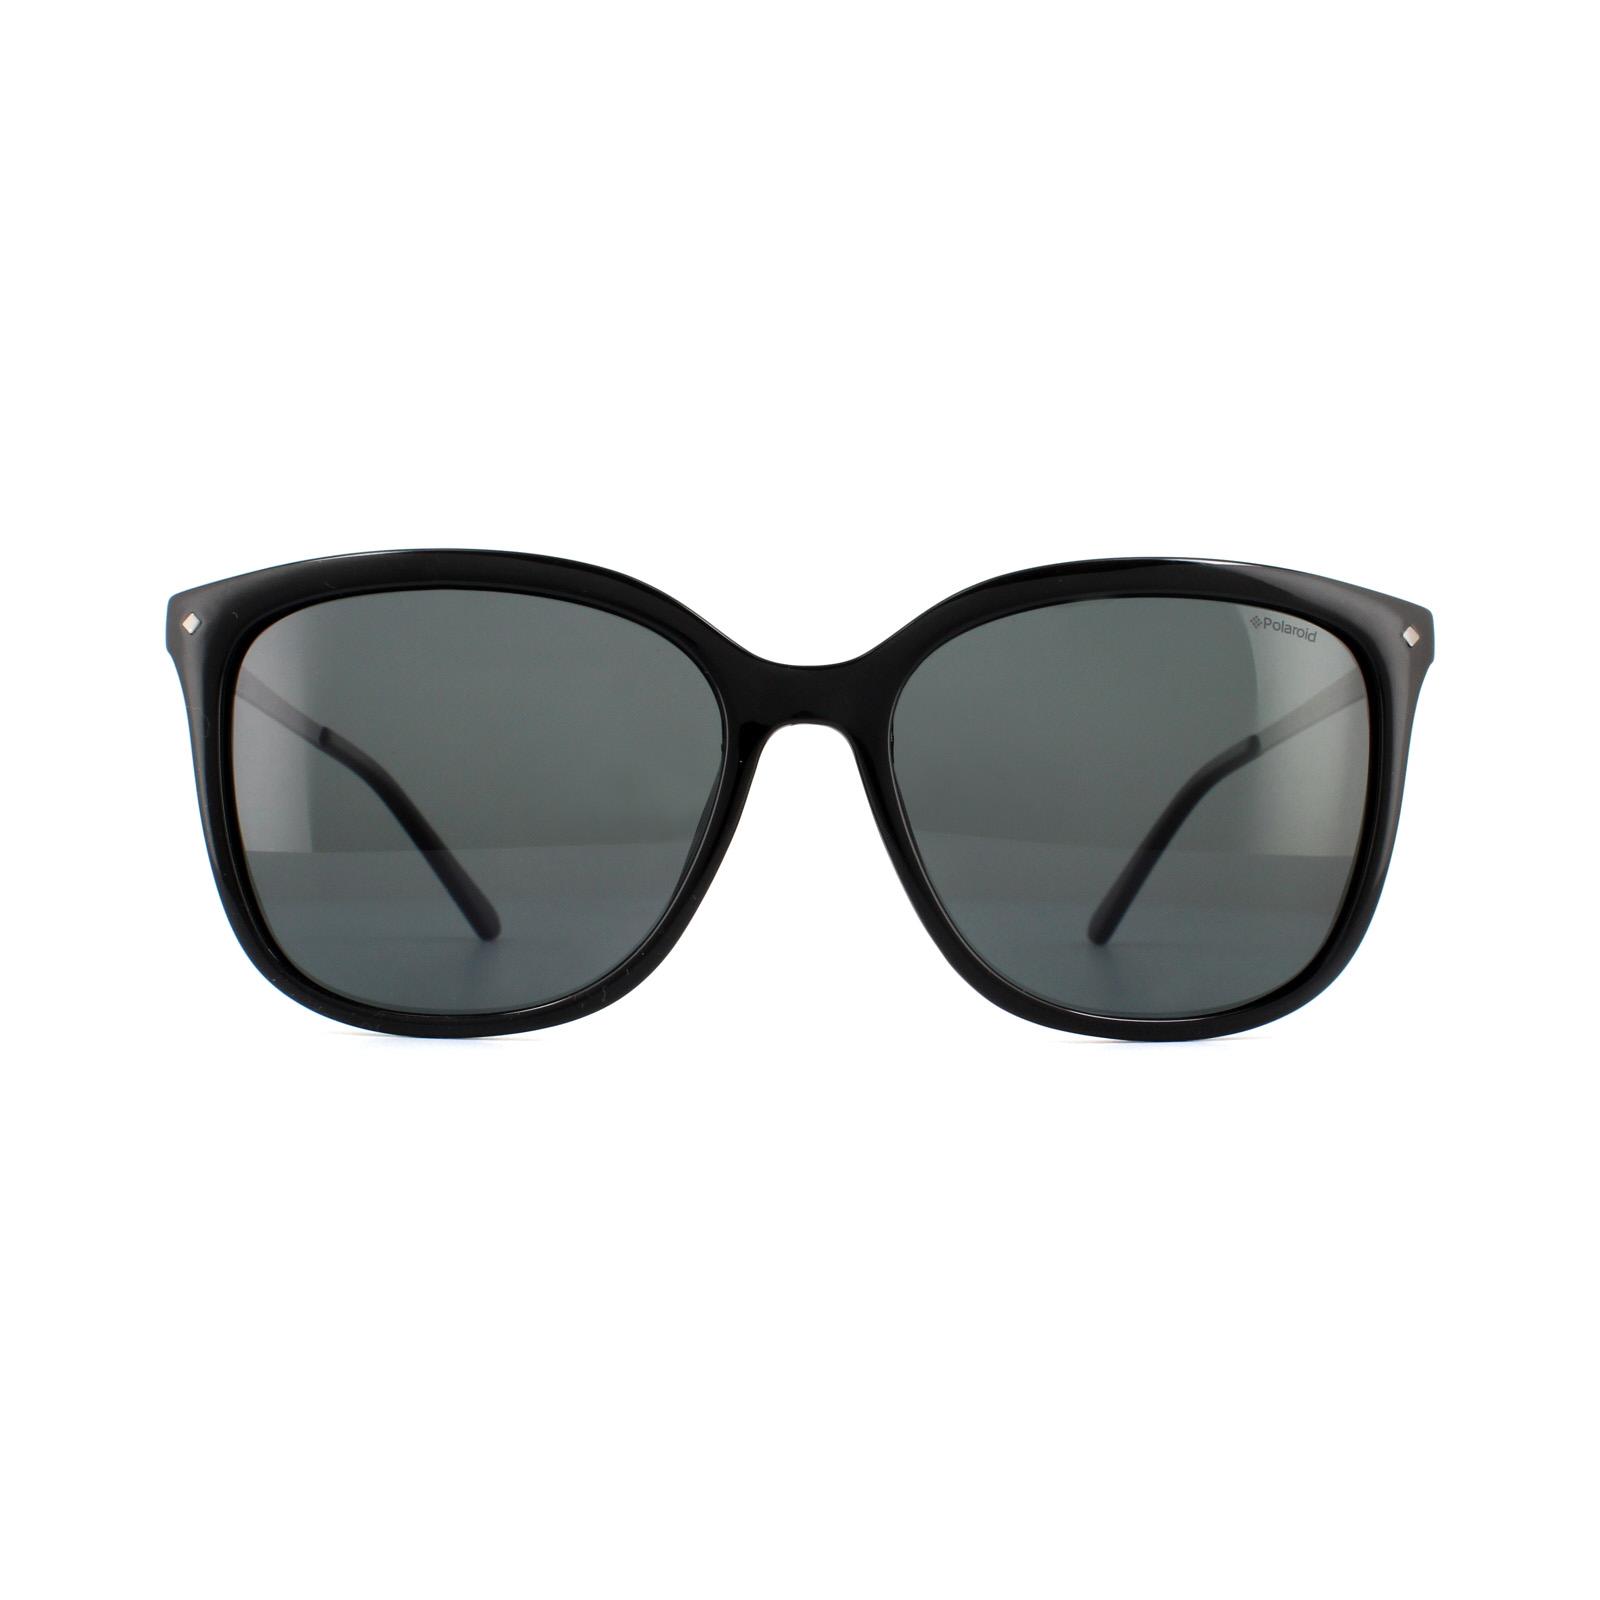 9e772ef7da1 Sentinel Polaroid Sunglasses PLD 4043 S CVS Y2 Black Grey Polarized